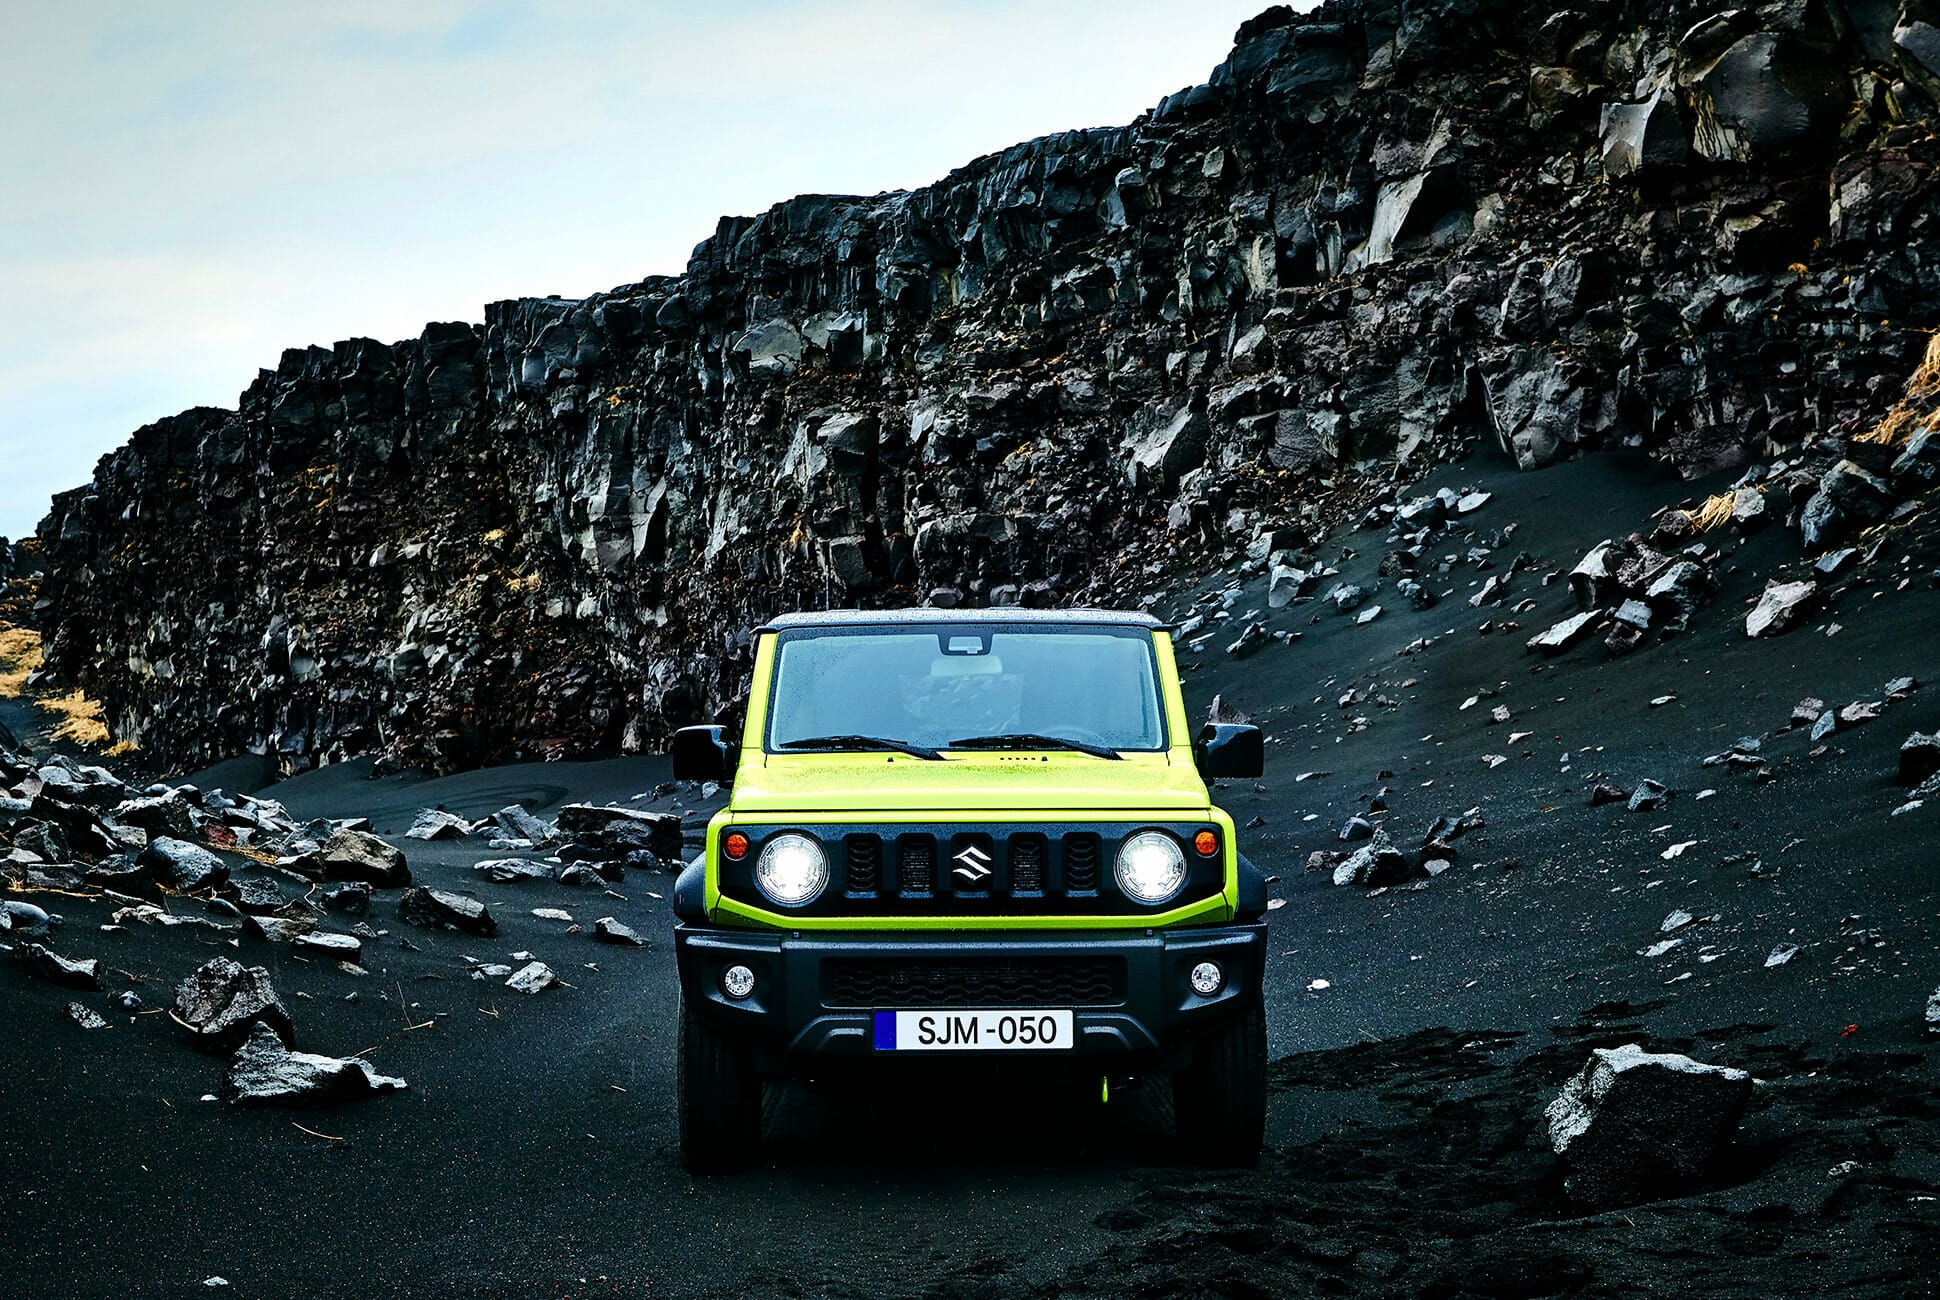 Suzuki-Jimny-Design-Award-gear-patrol-slide-1